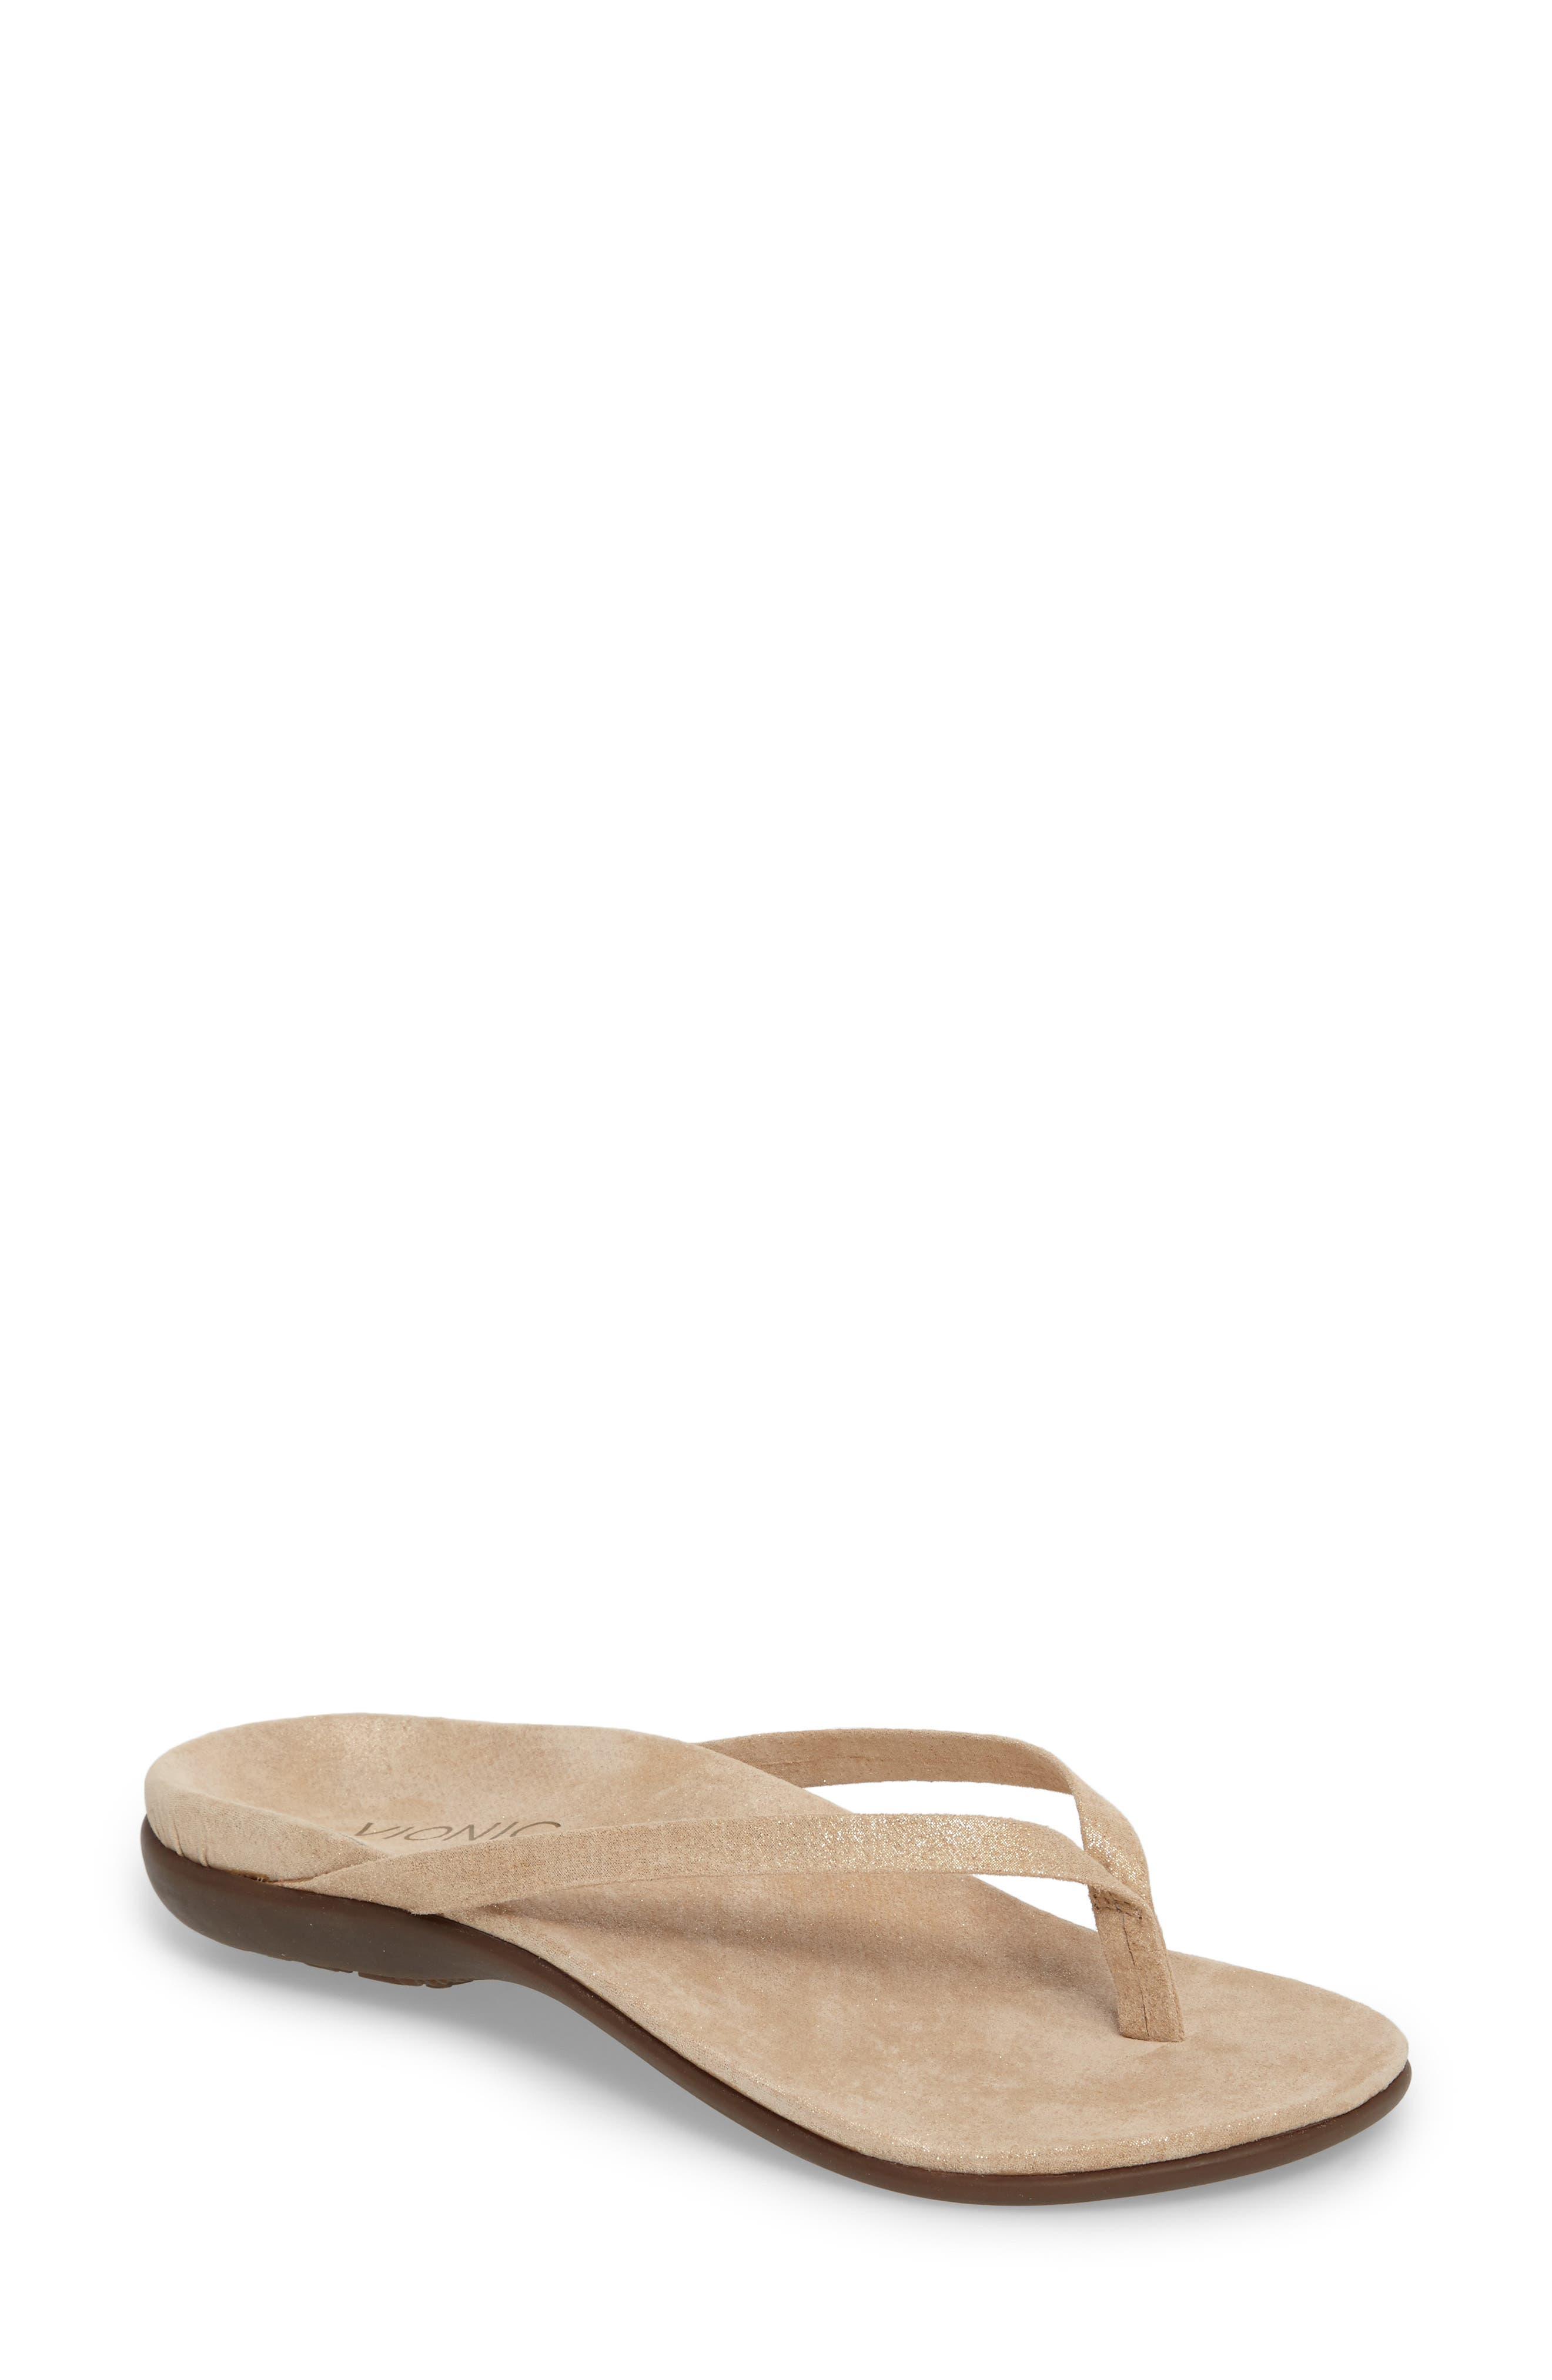 'Corfu' Sandal,                         Main,                         color, 290